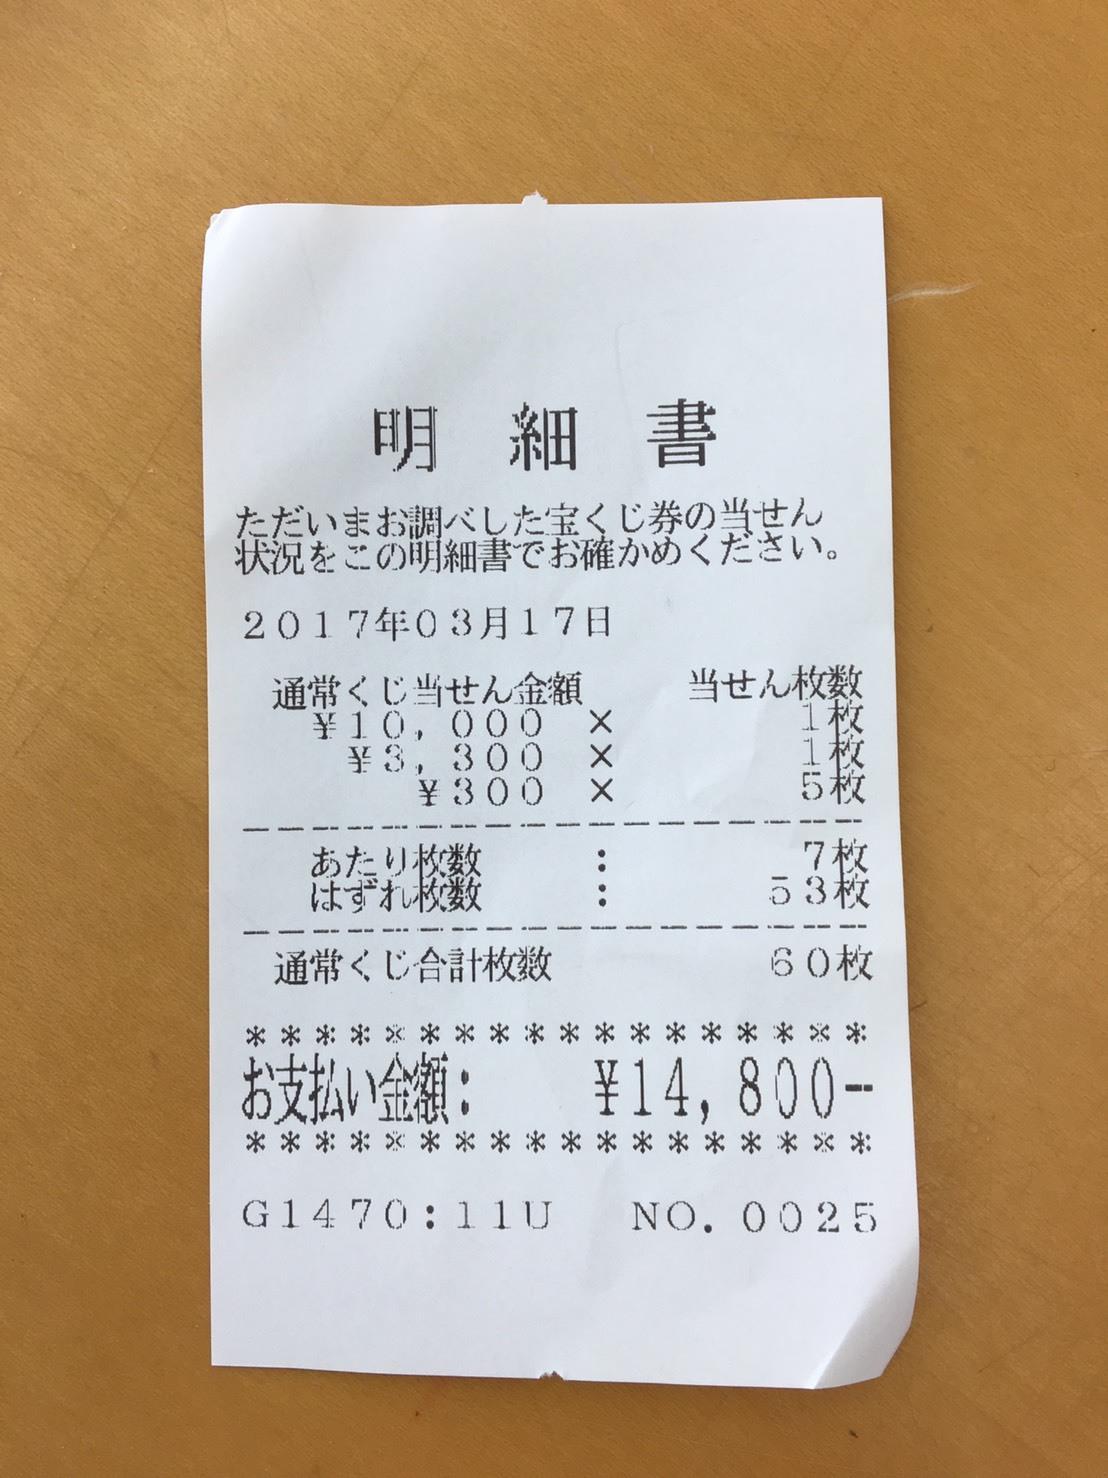 S__4743192.jpg